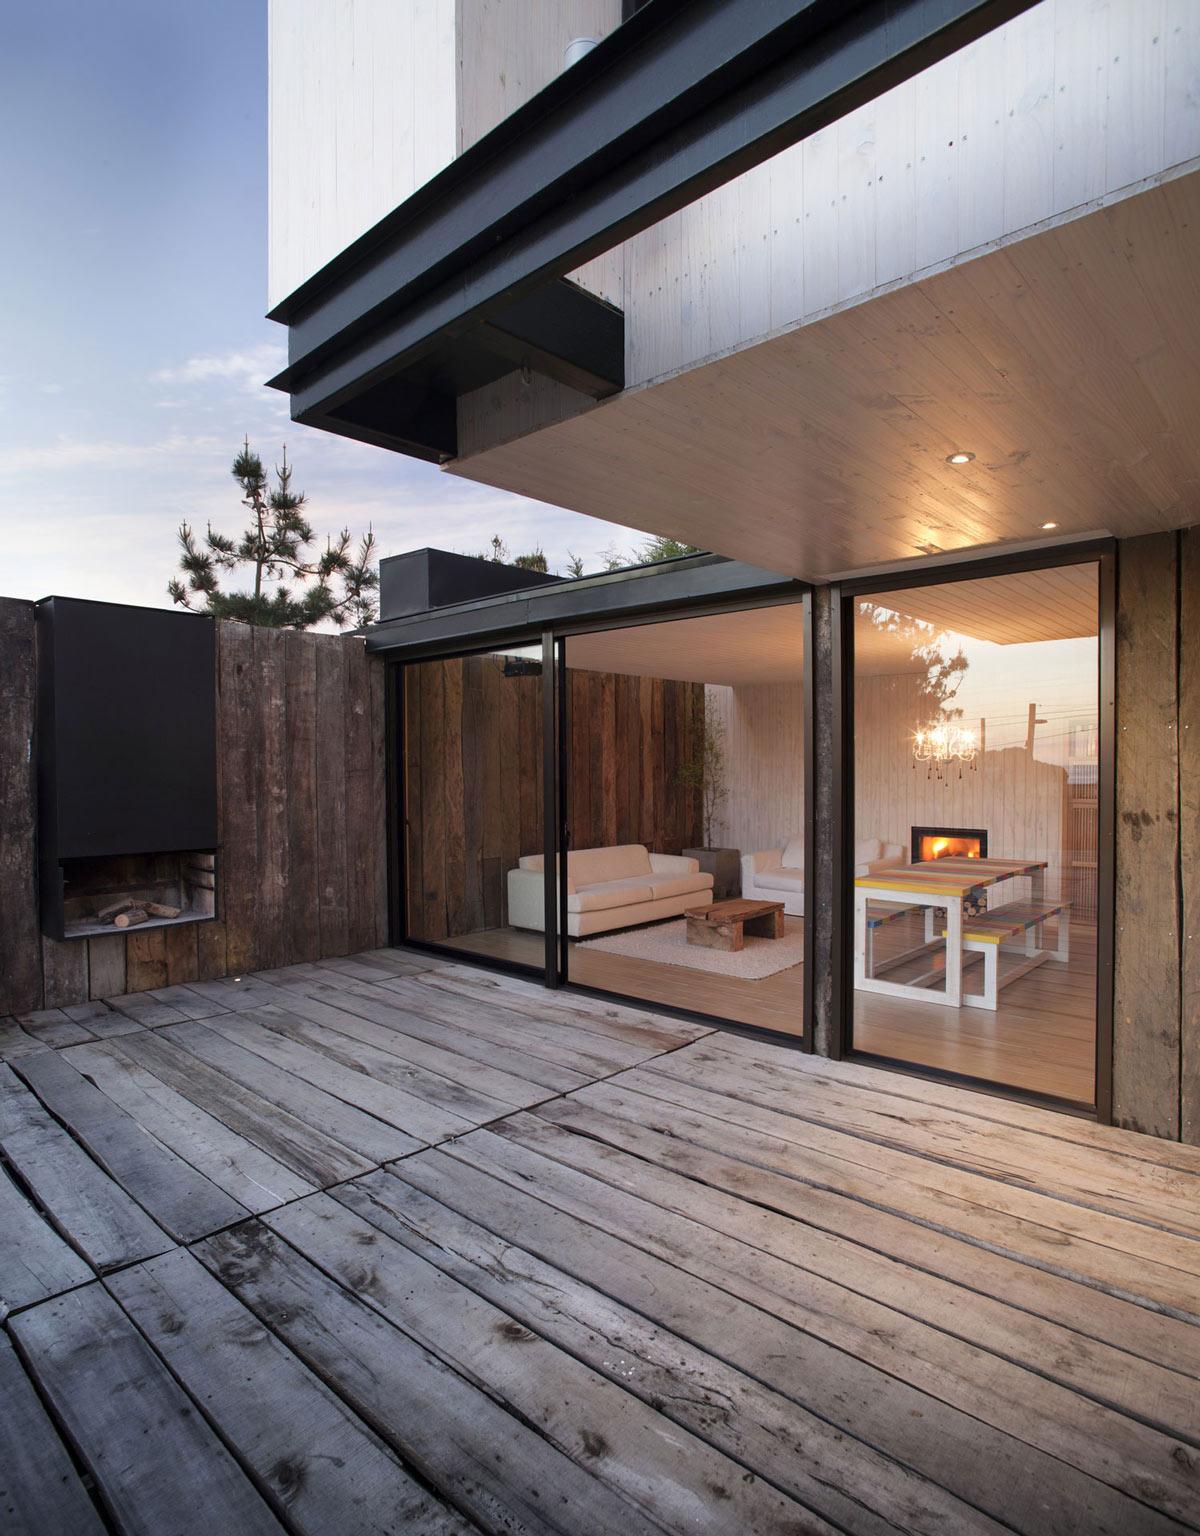 Outdoor Fireplace, Terrace, Patio Doors, Family Home in Algarrobo, Chile